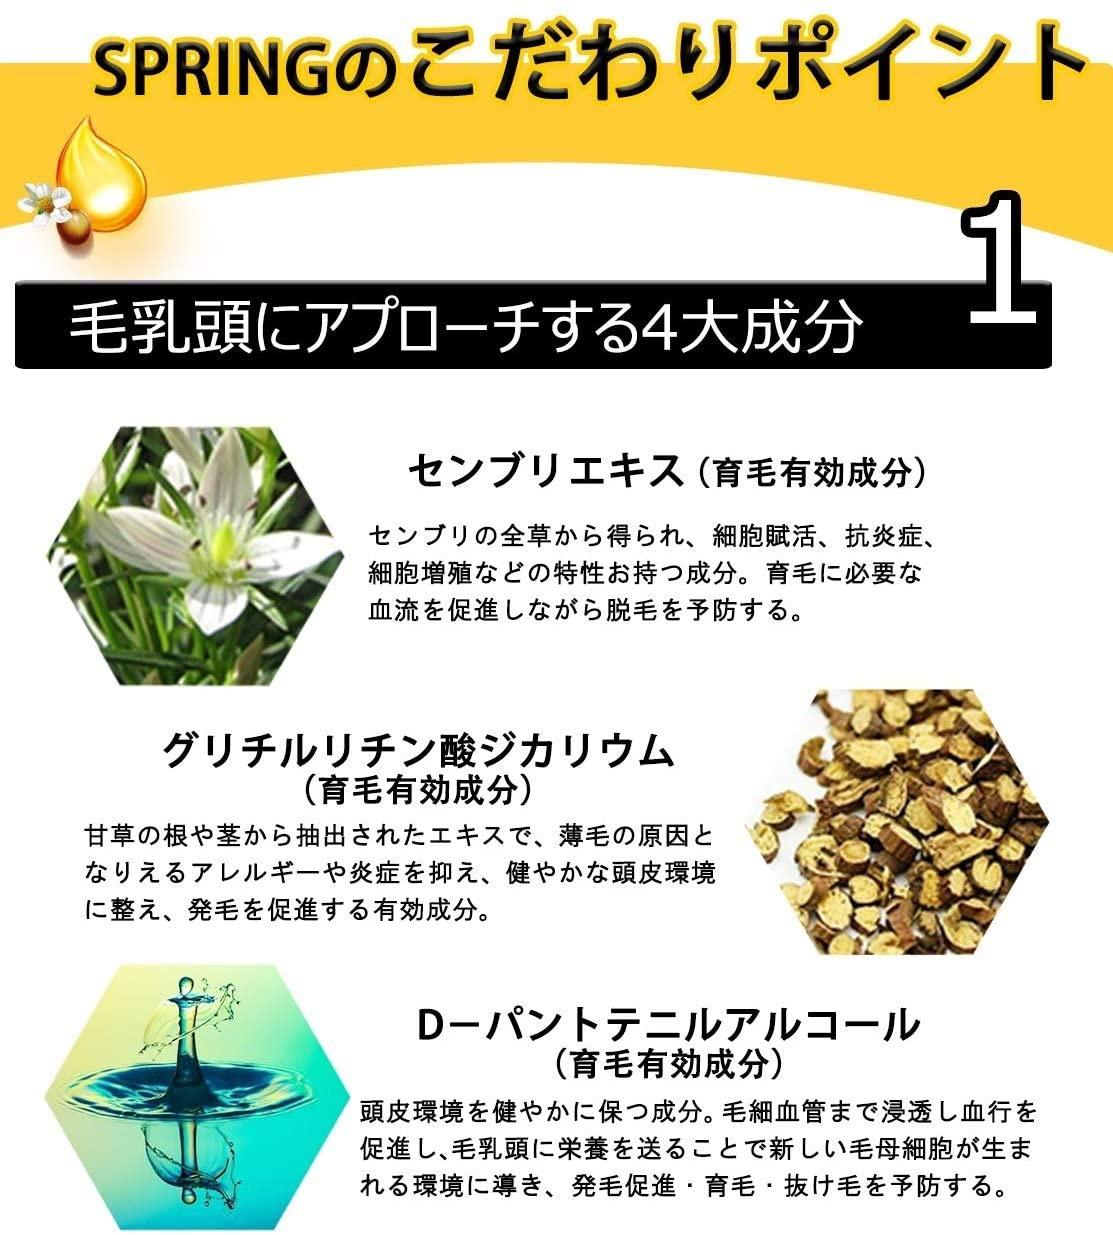 SPRING(スプリング) 薬用 育毛 エッセンスの商品画像5